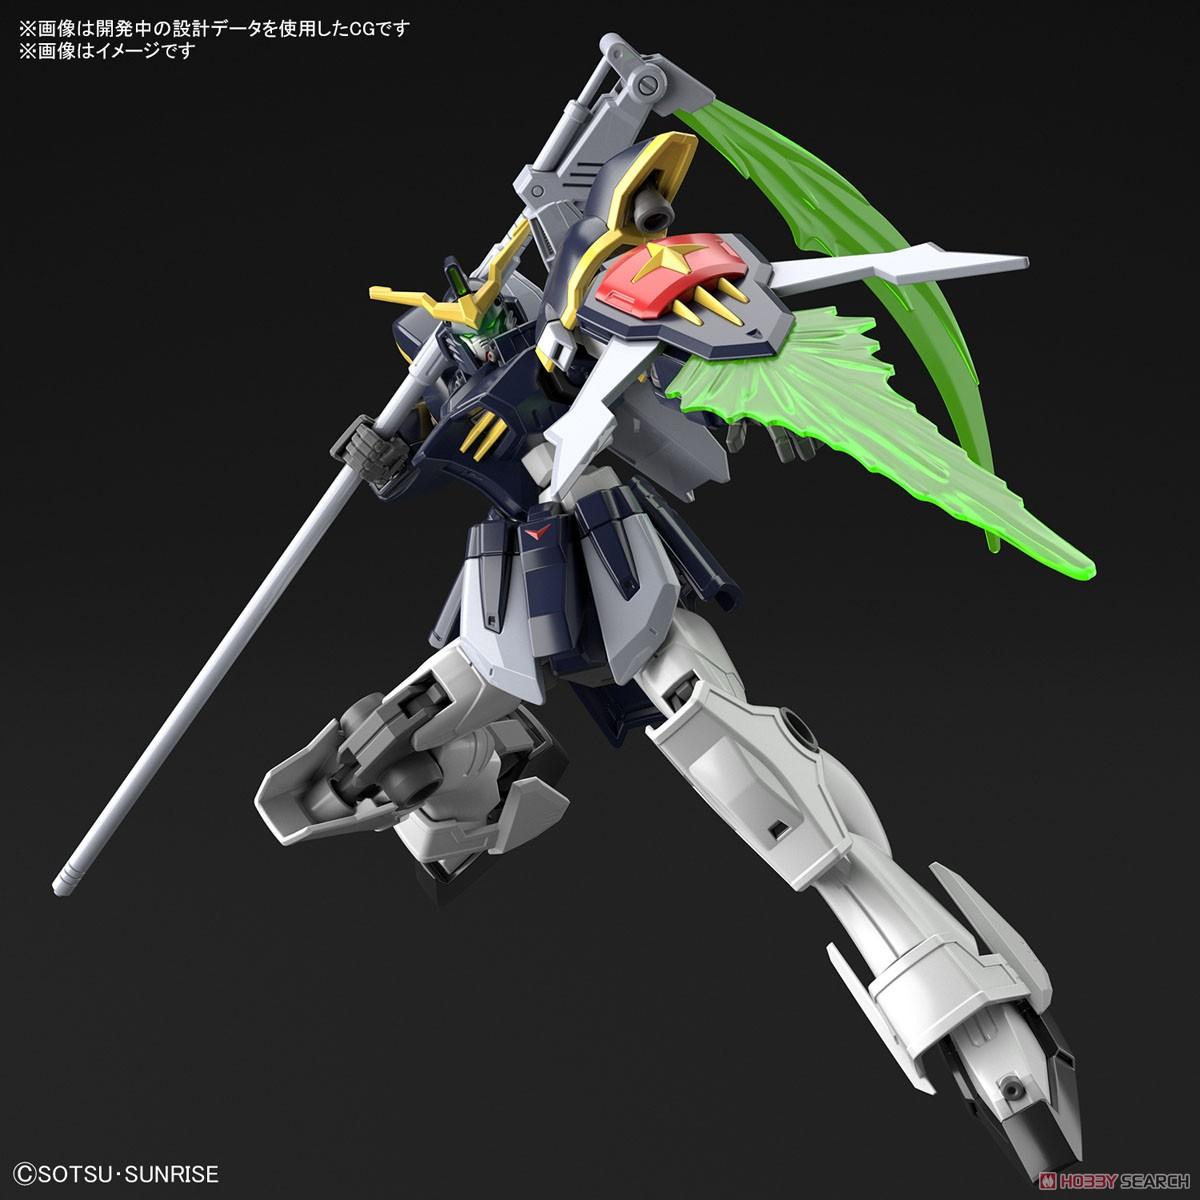 HGAC 1/144『ガンダムデスサイズ』新機動戦記ガンダムW プラモデル-003